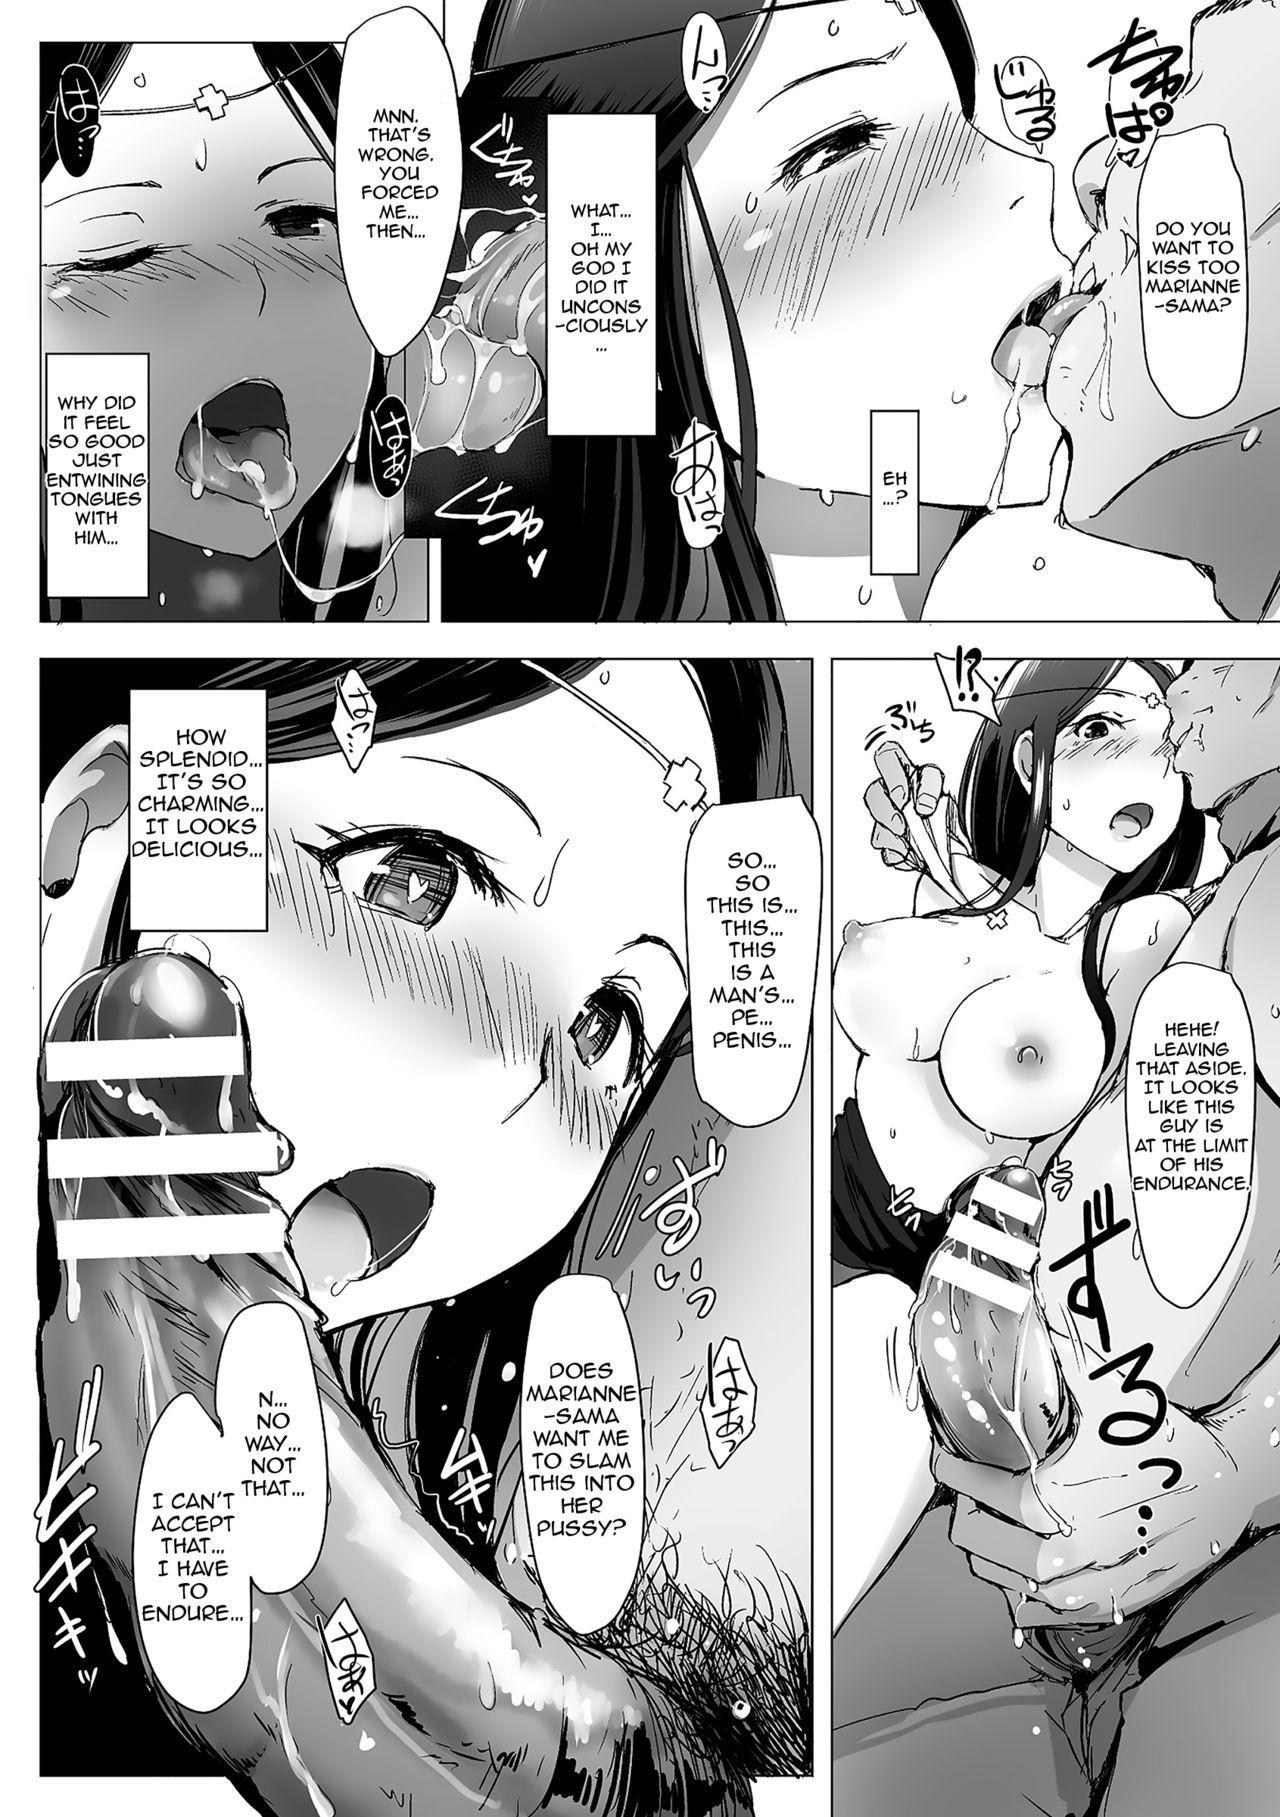 Yamaneko Kishidan Monogatari Onna Kishi Irina Dainiwa | The Tale of the Wildcat Chivalric Order's Knight Irina, Second Story 17